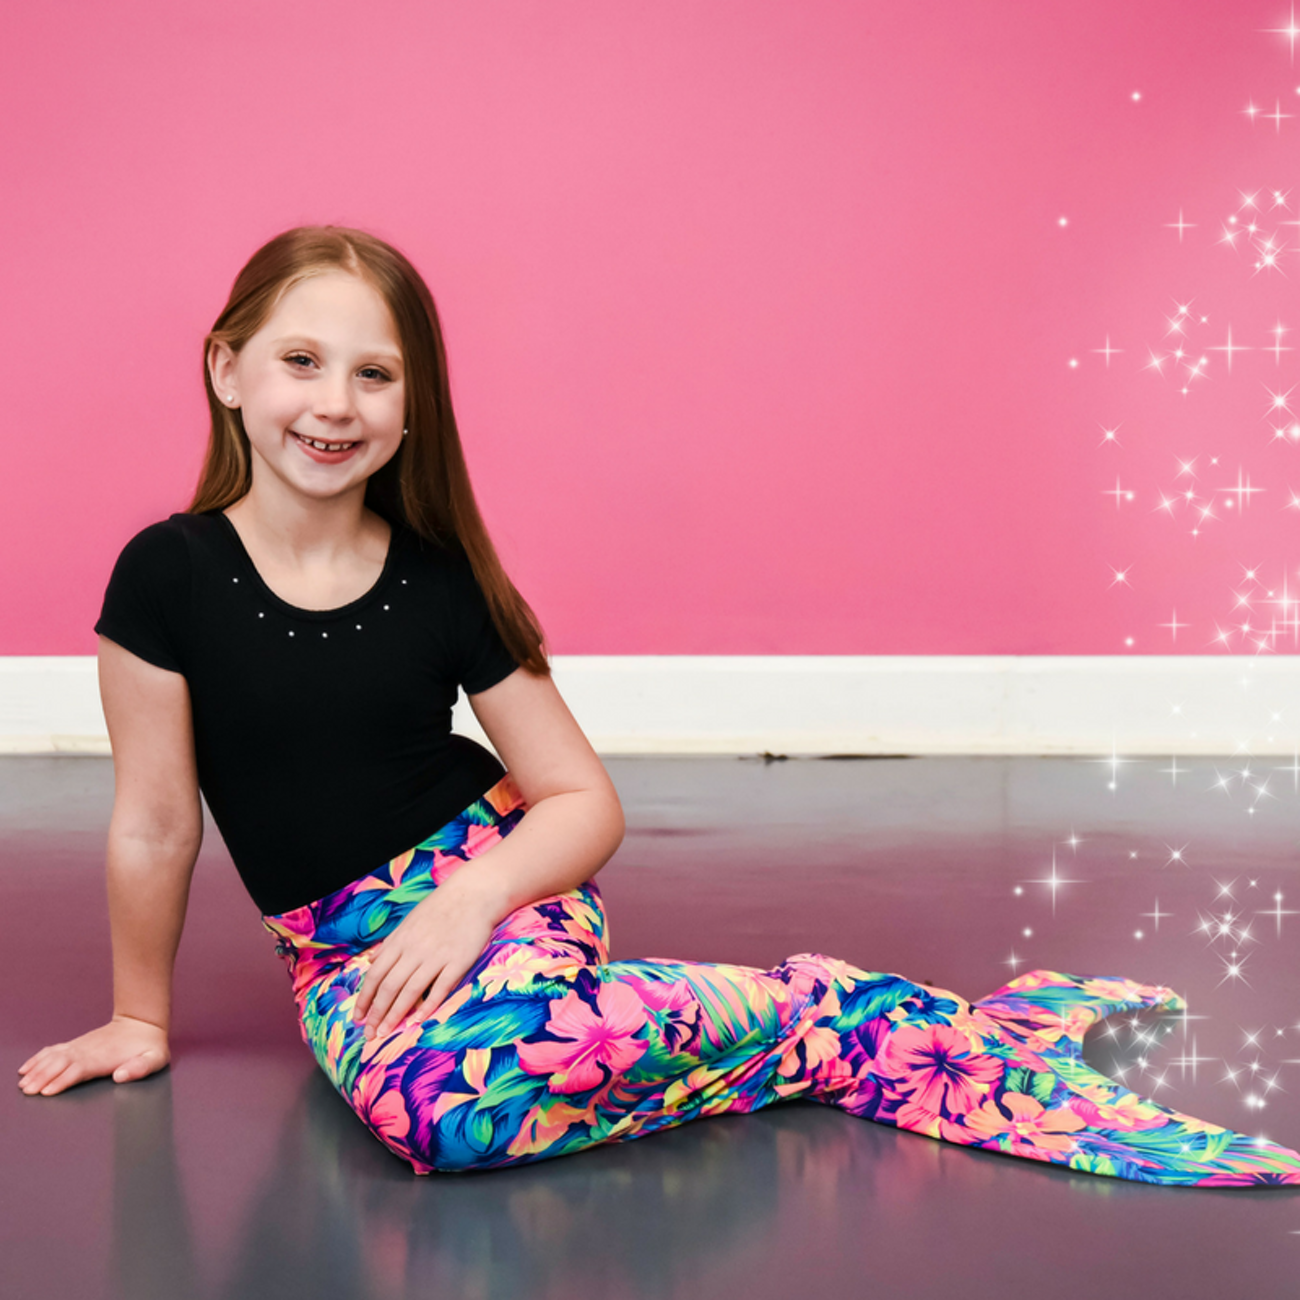 MAGICAL MERMAID TUMBLING Age 5-6